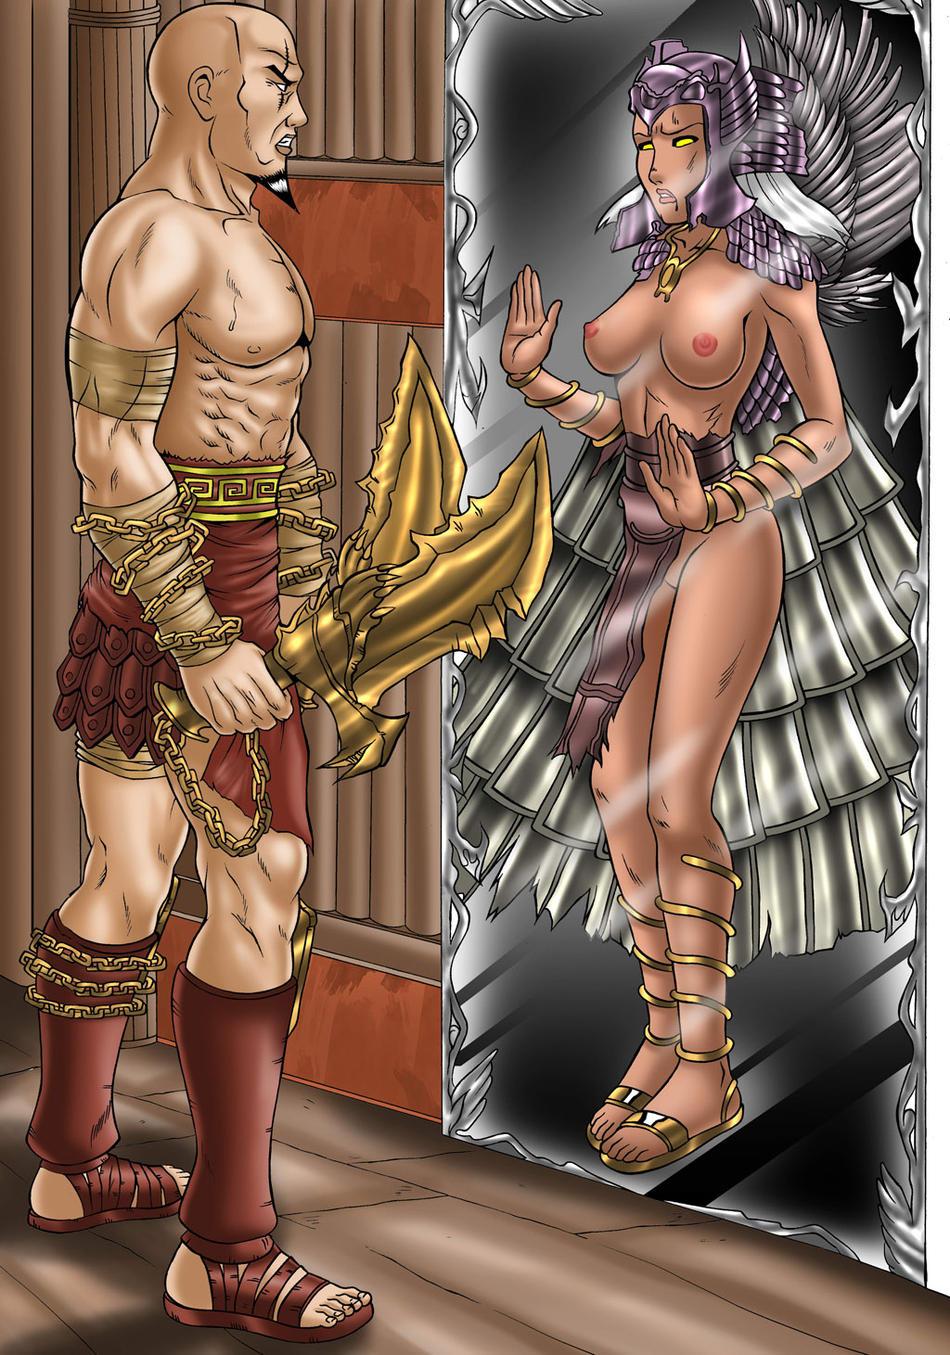 princess war of poseidon's god My hero academia jiro porn